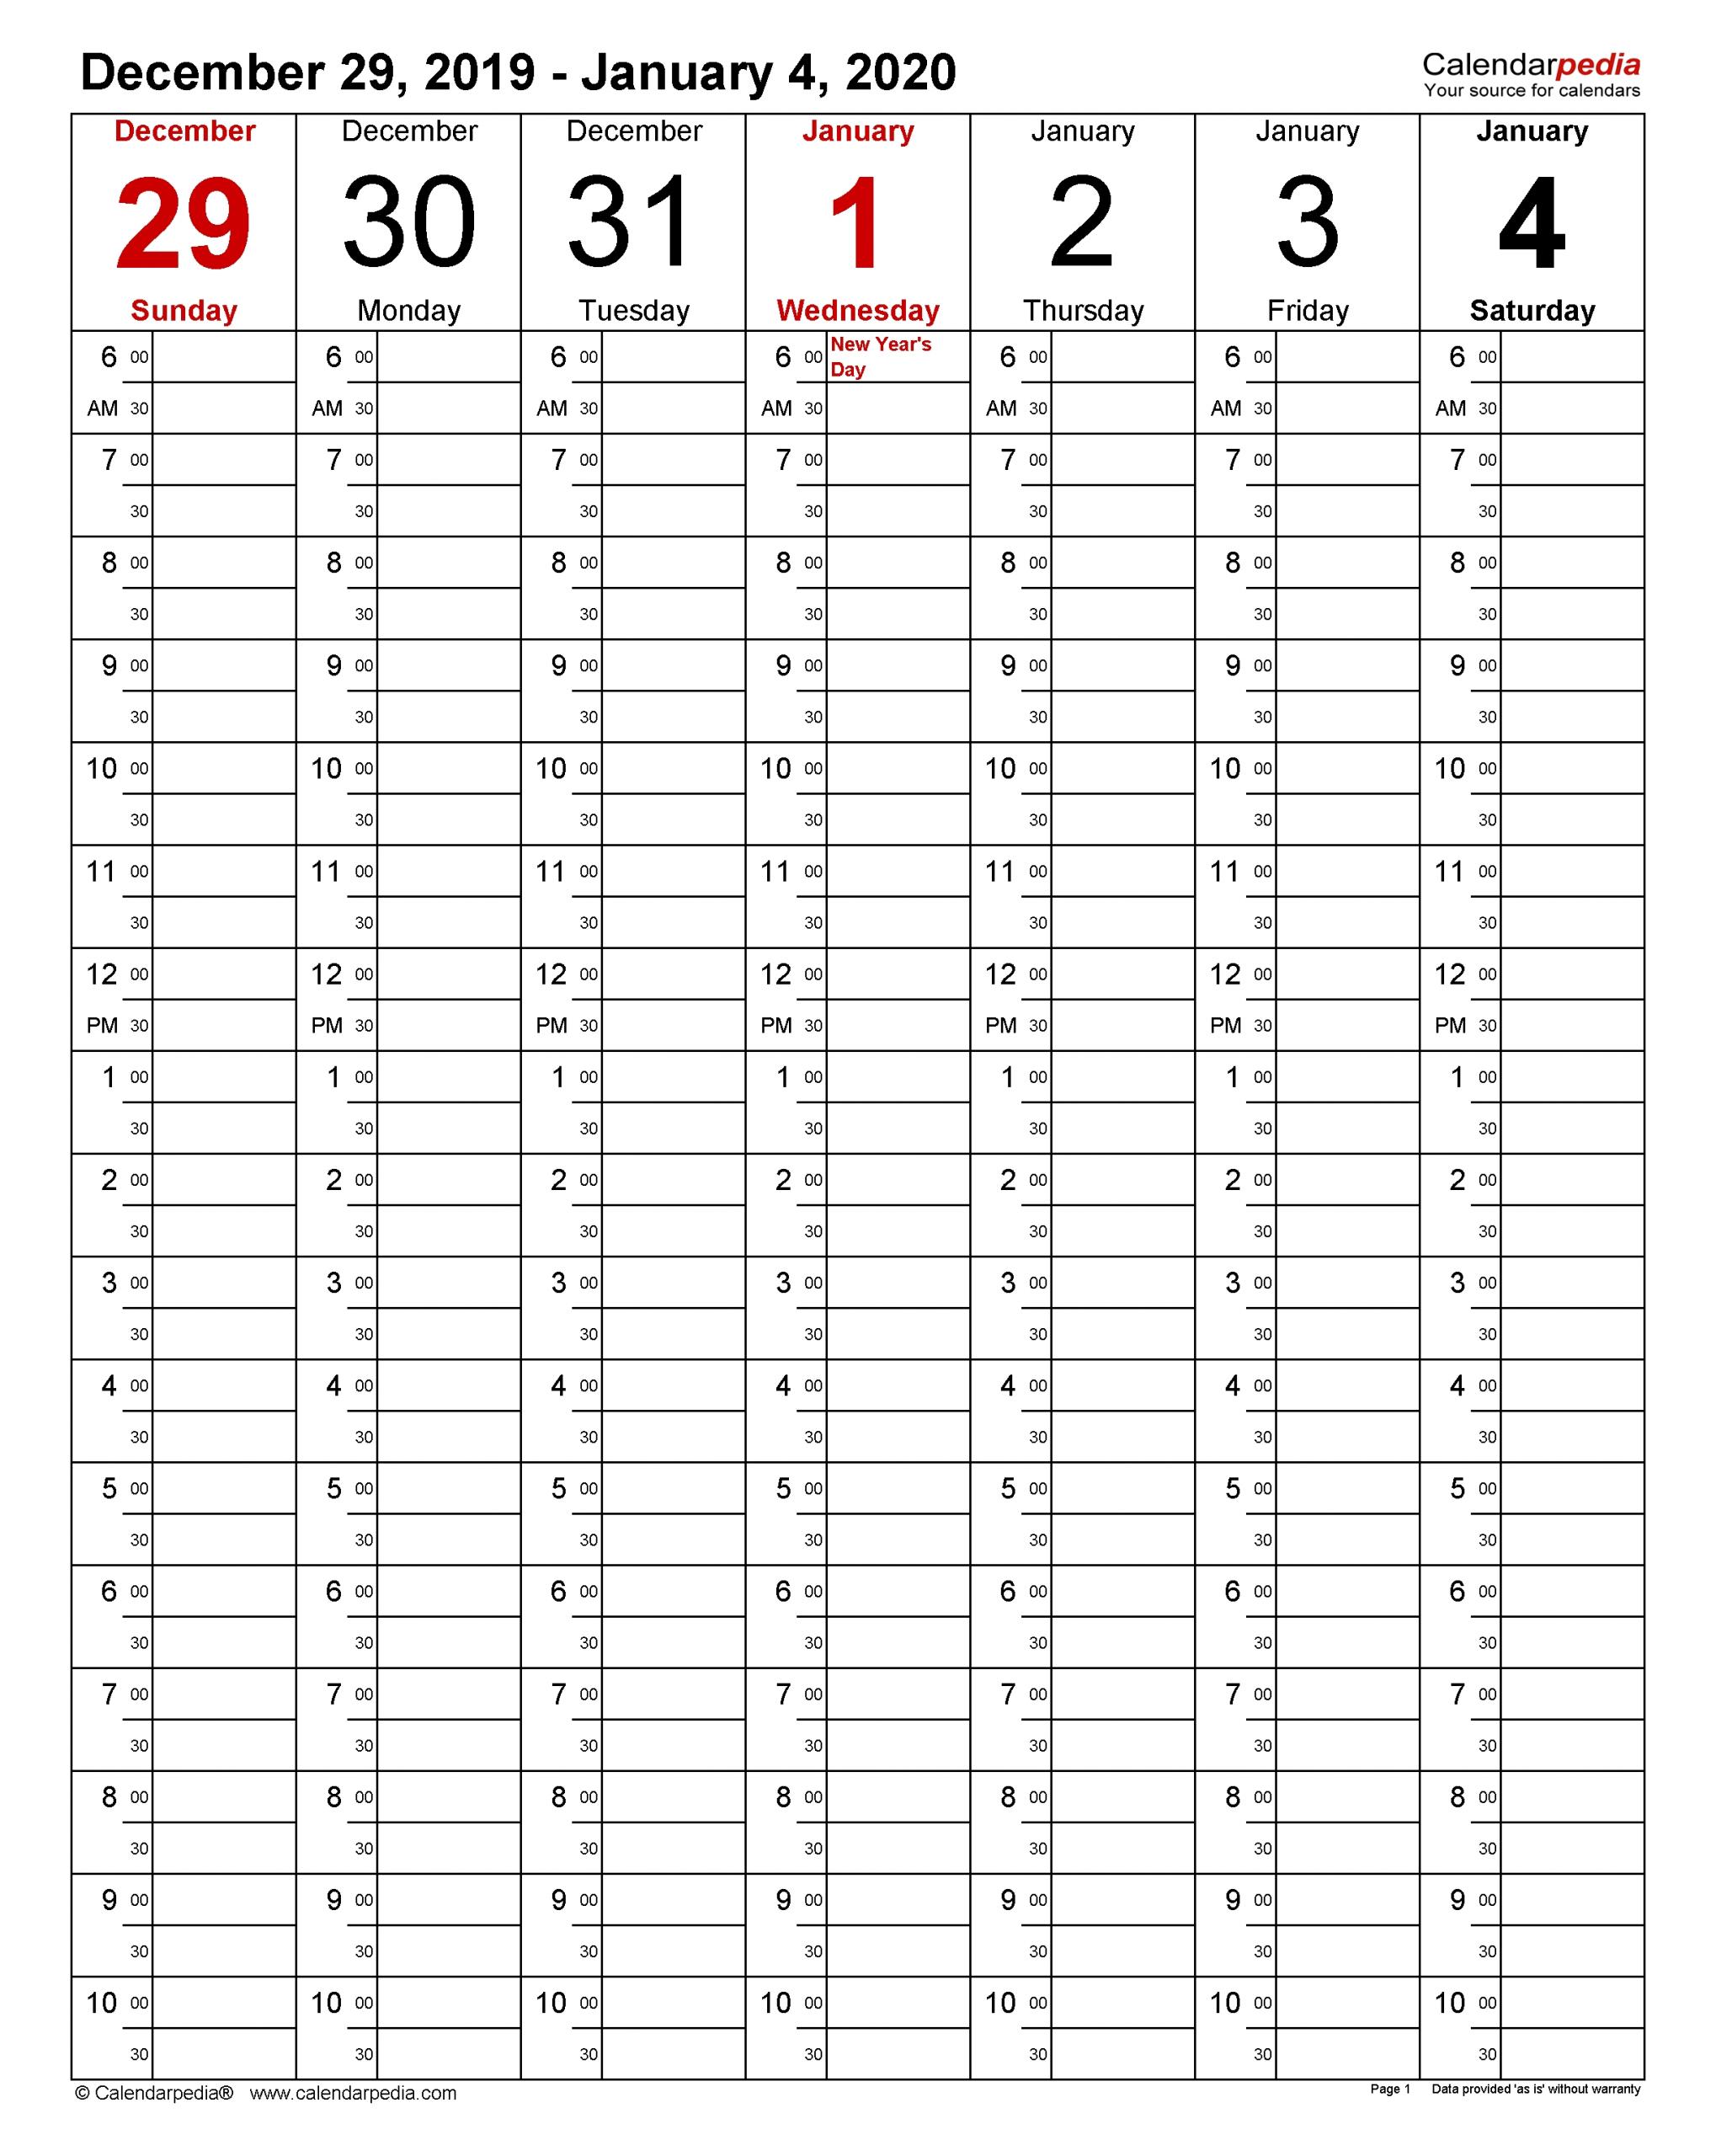 Weekly Calendars 2020 For Pdf - 12 Free Printable Templates within Free Printable 2020 Calendars Large Numbers